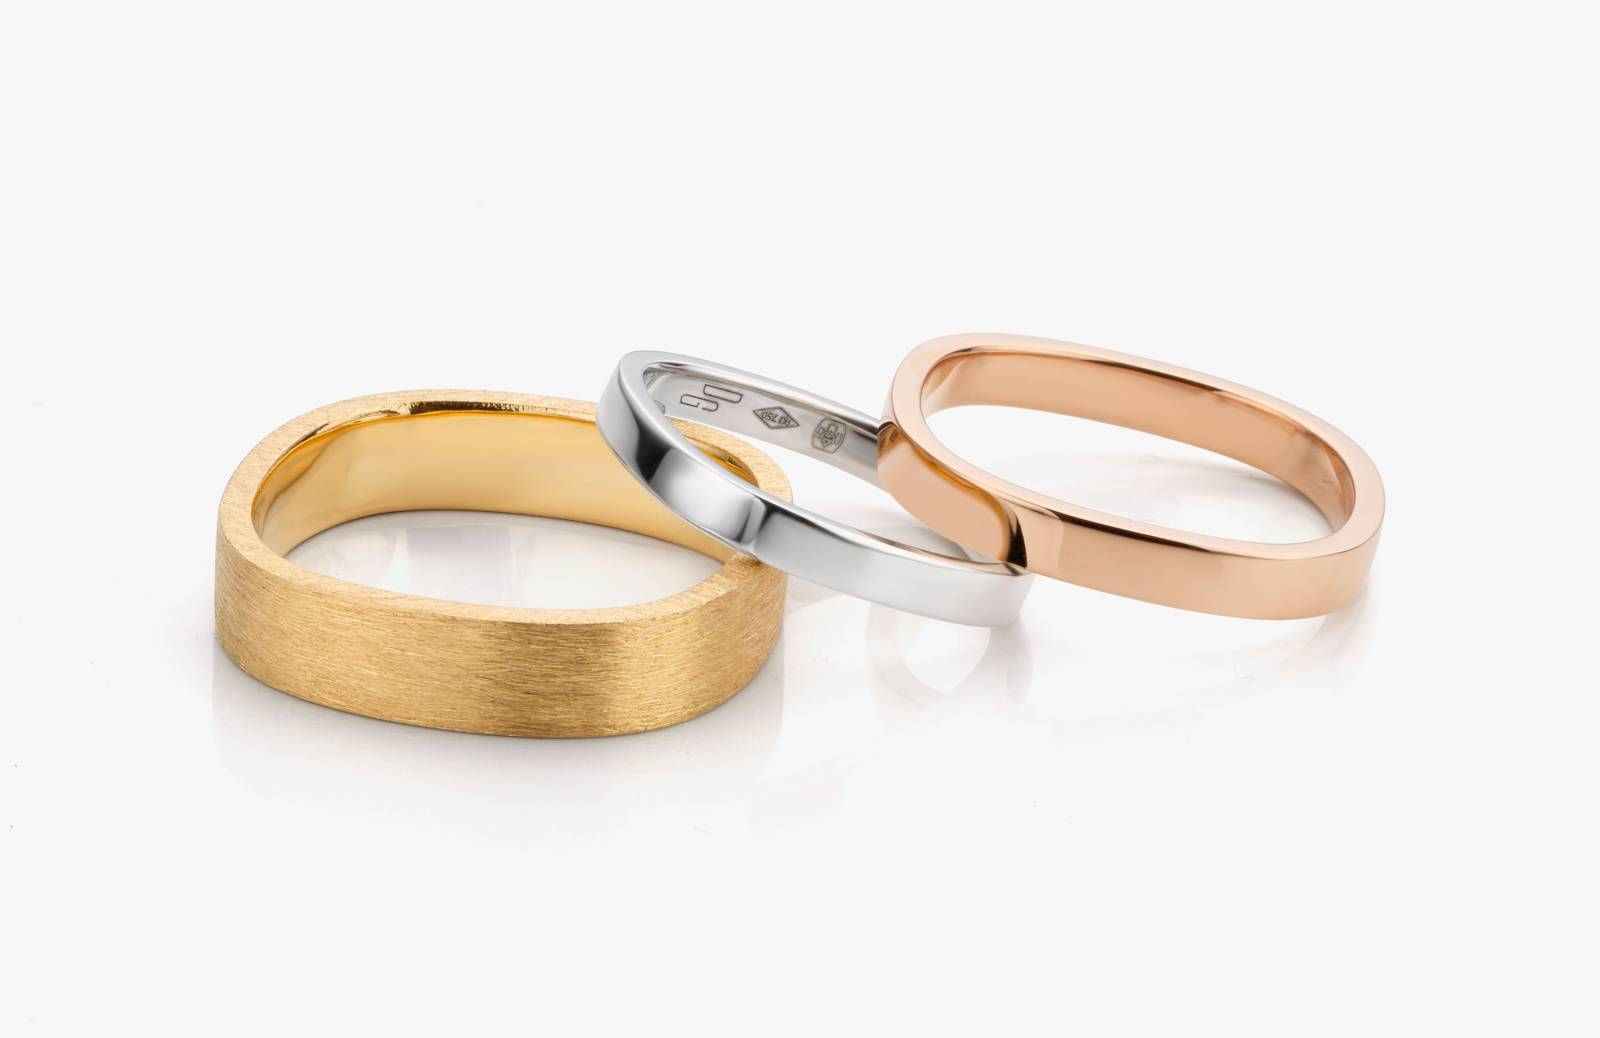 Maison De Greef - Juwelen - Brussel - Bruidsjuwelen - Trouwring - Verlovingsring - House of Weddings - 8